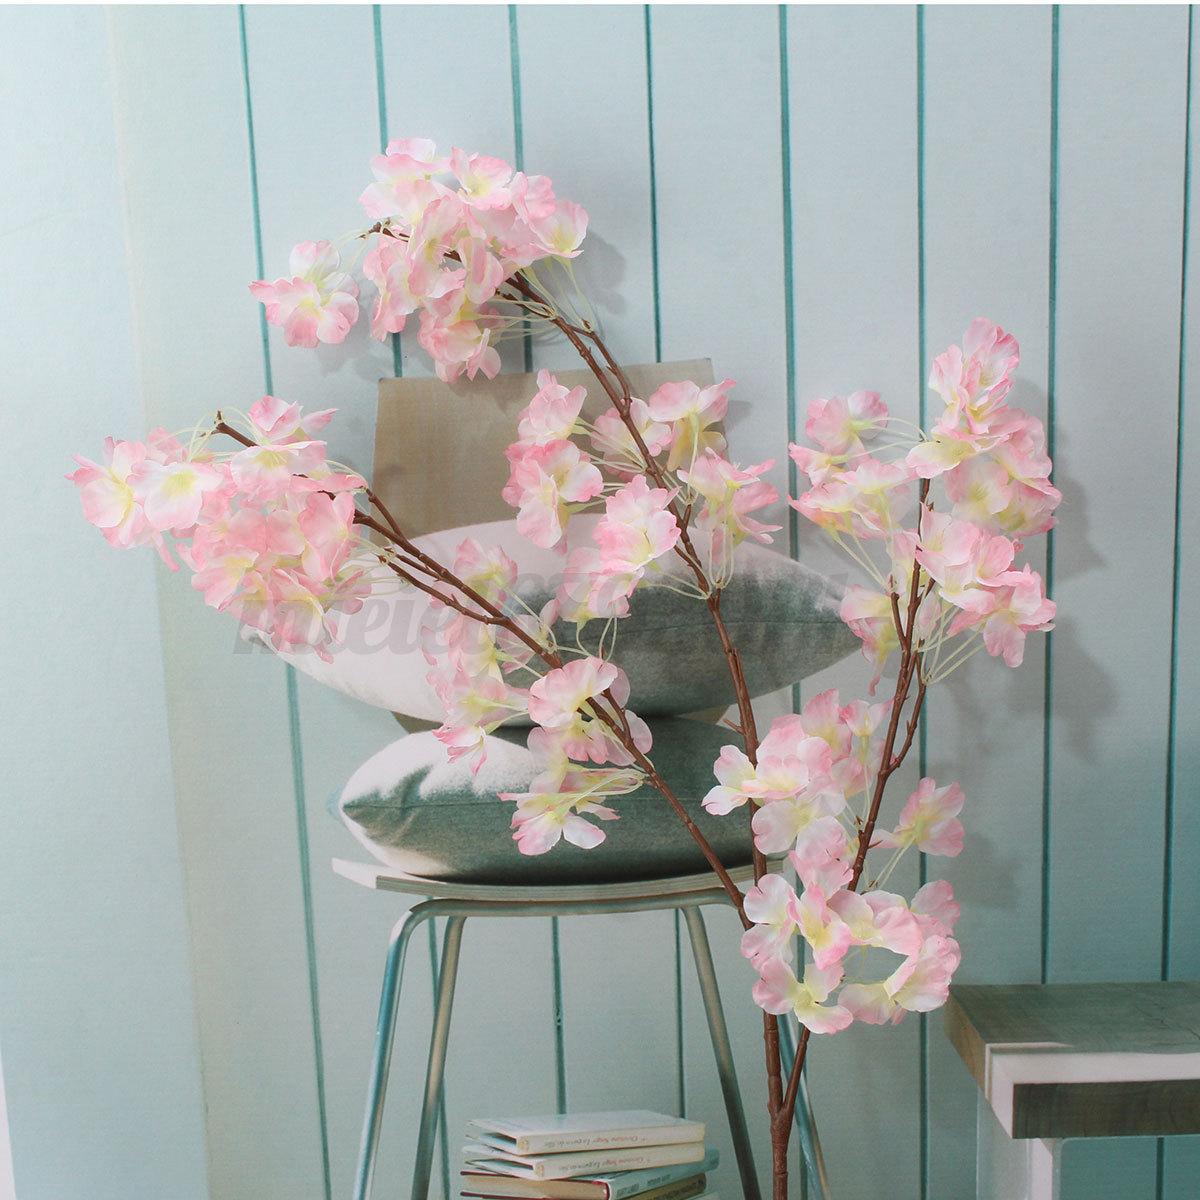 1 Stem 3 Branchs Artificial Plum Peach Cherry Blossom Silk